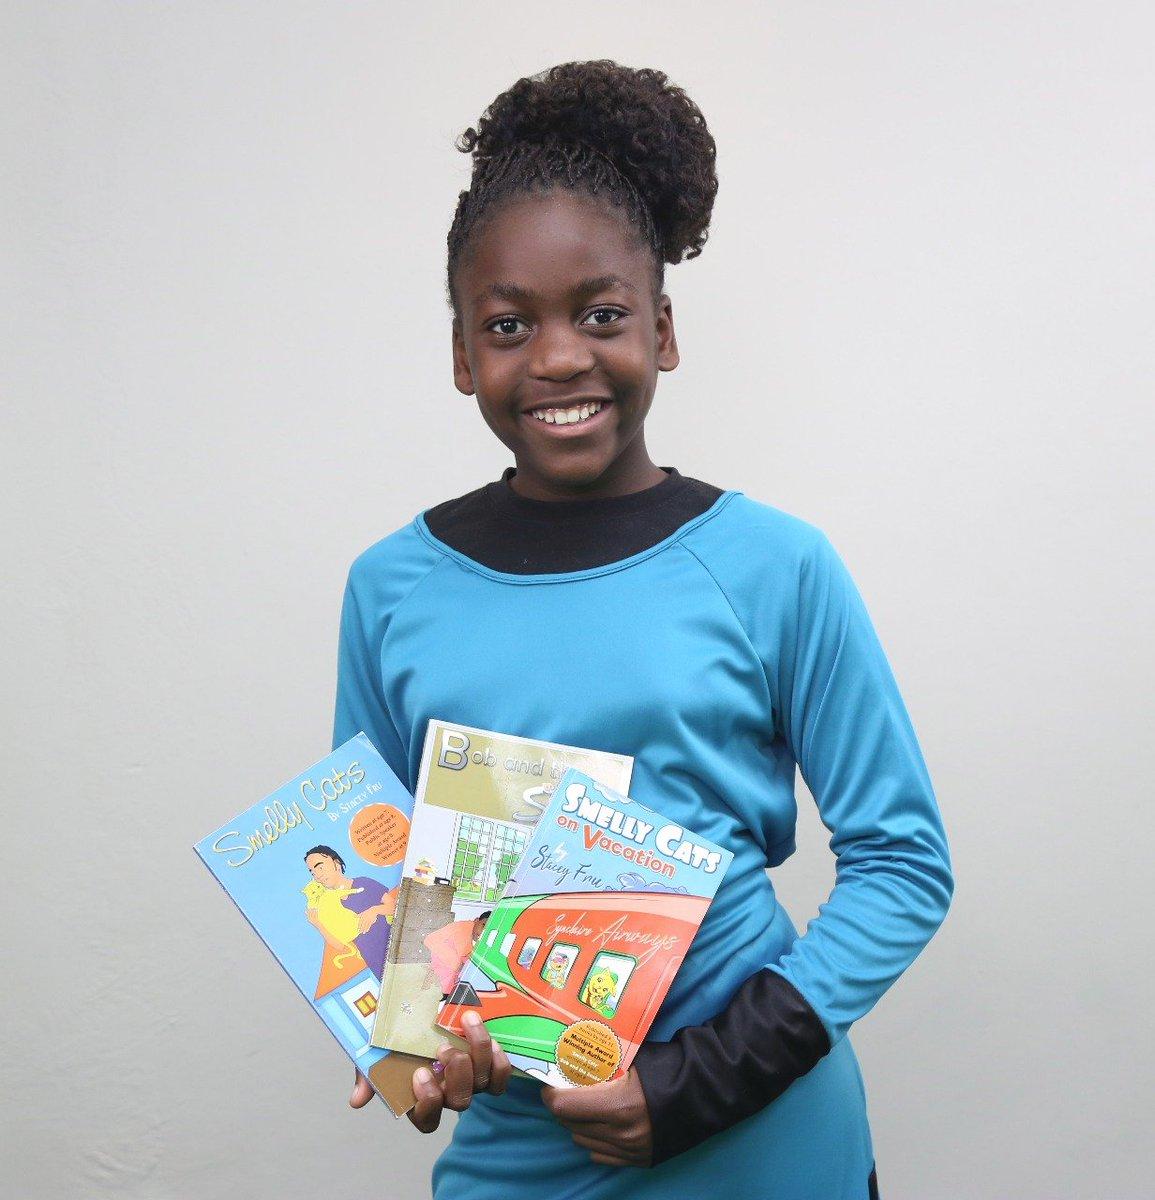 Stacey Fru, The 13-Year-Old International Award-Winning Author - GCP Awards  Blog